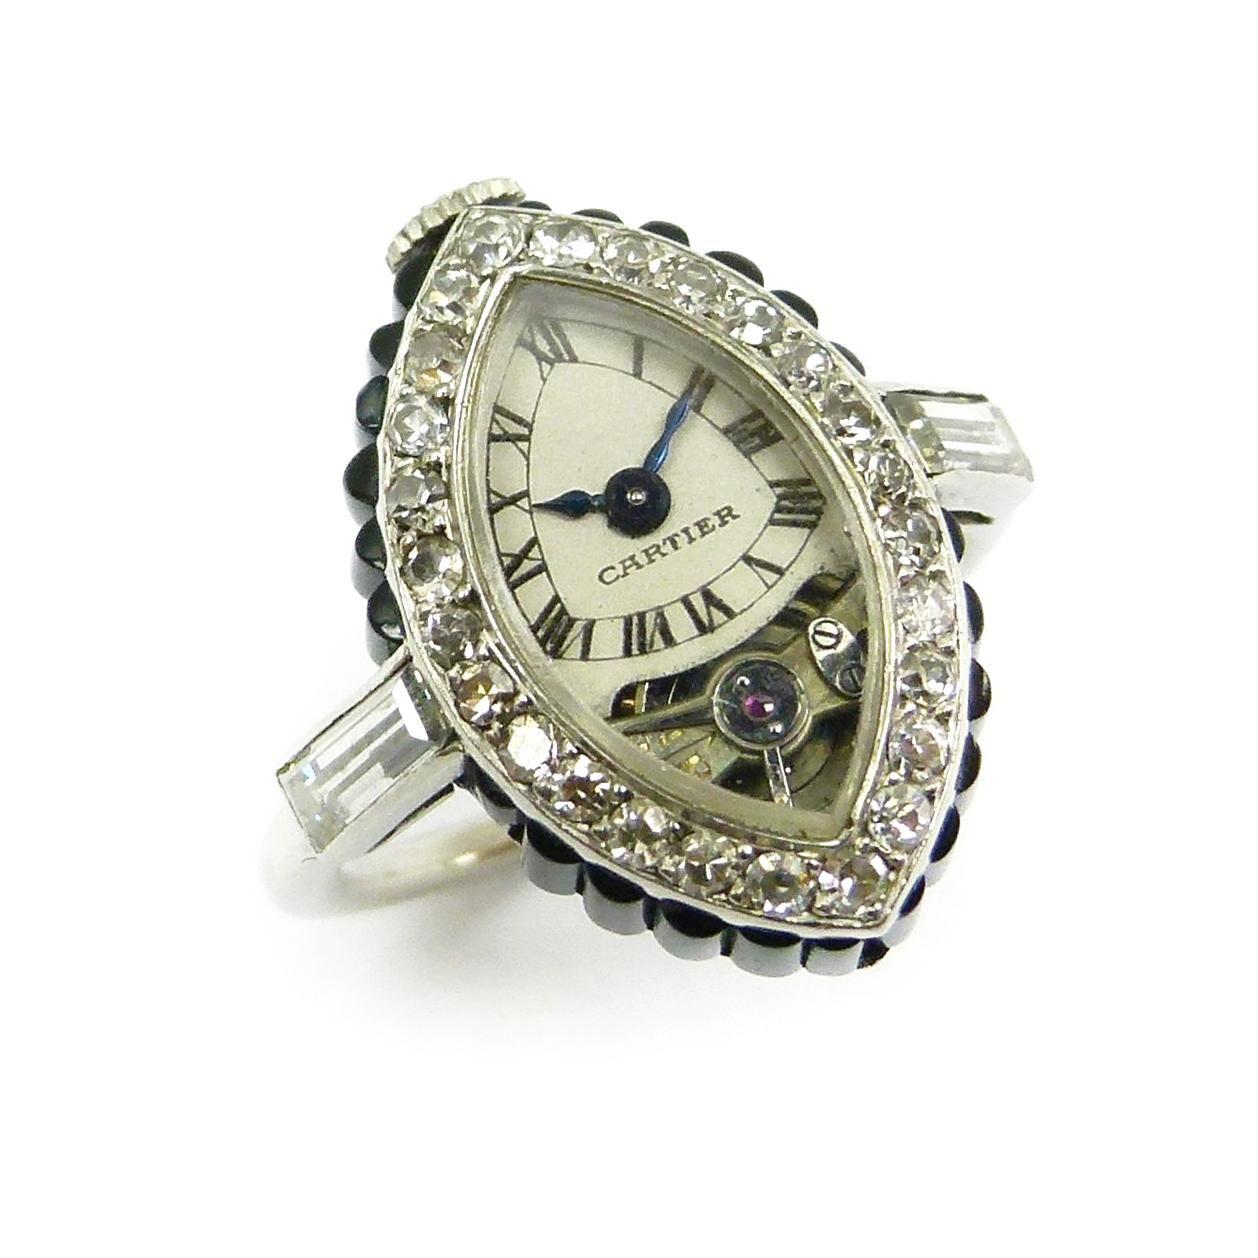 Art deco onyx and diamond montre bague navette keyless